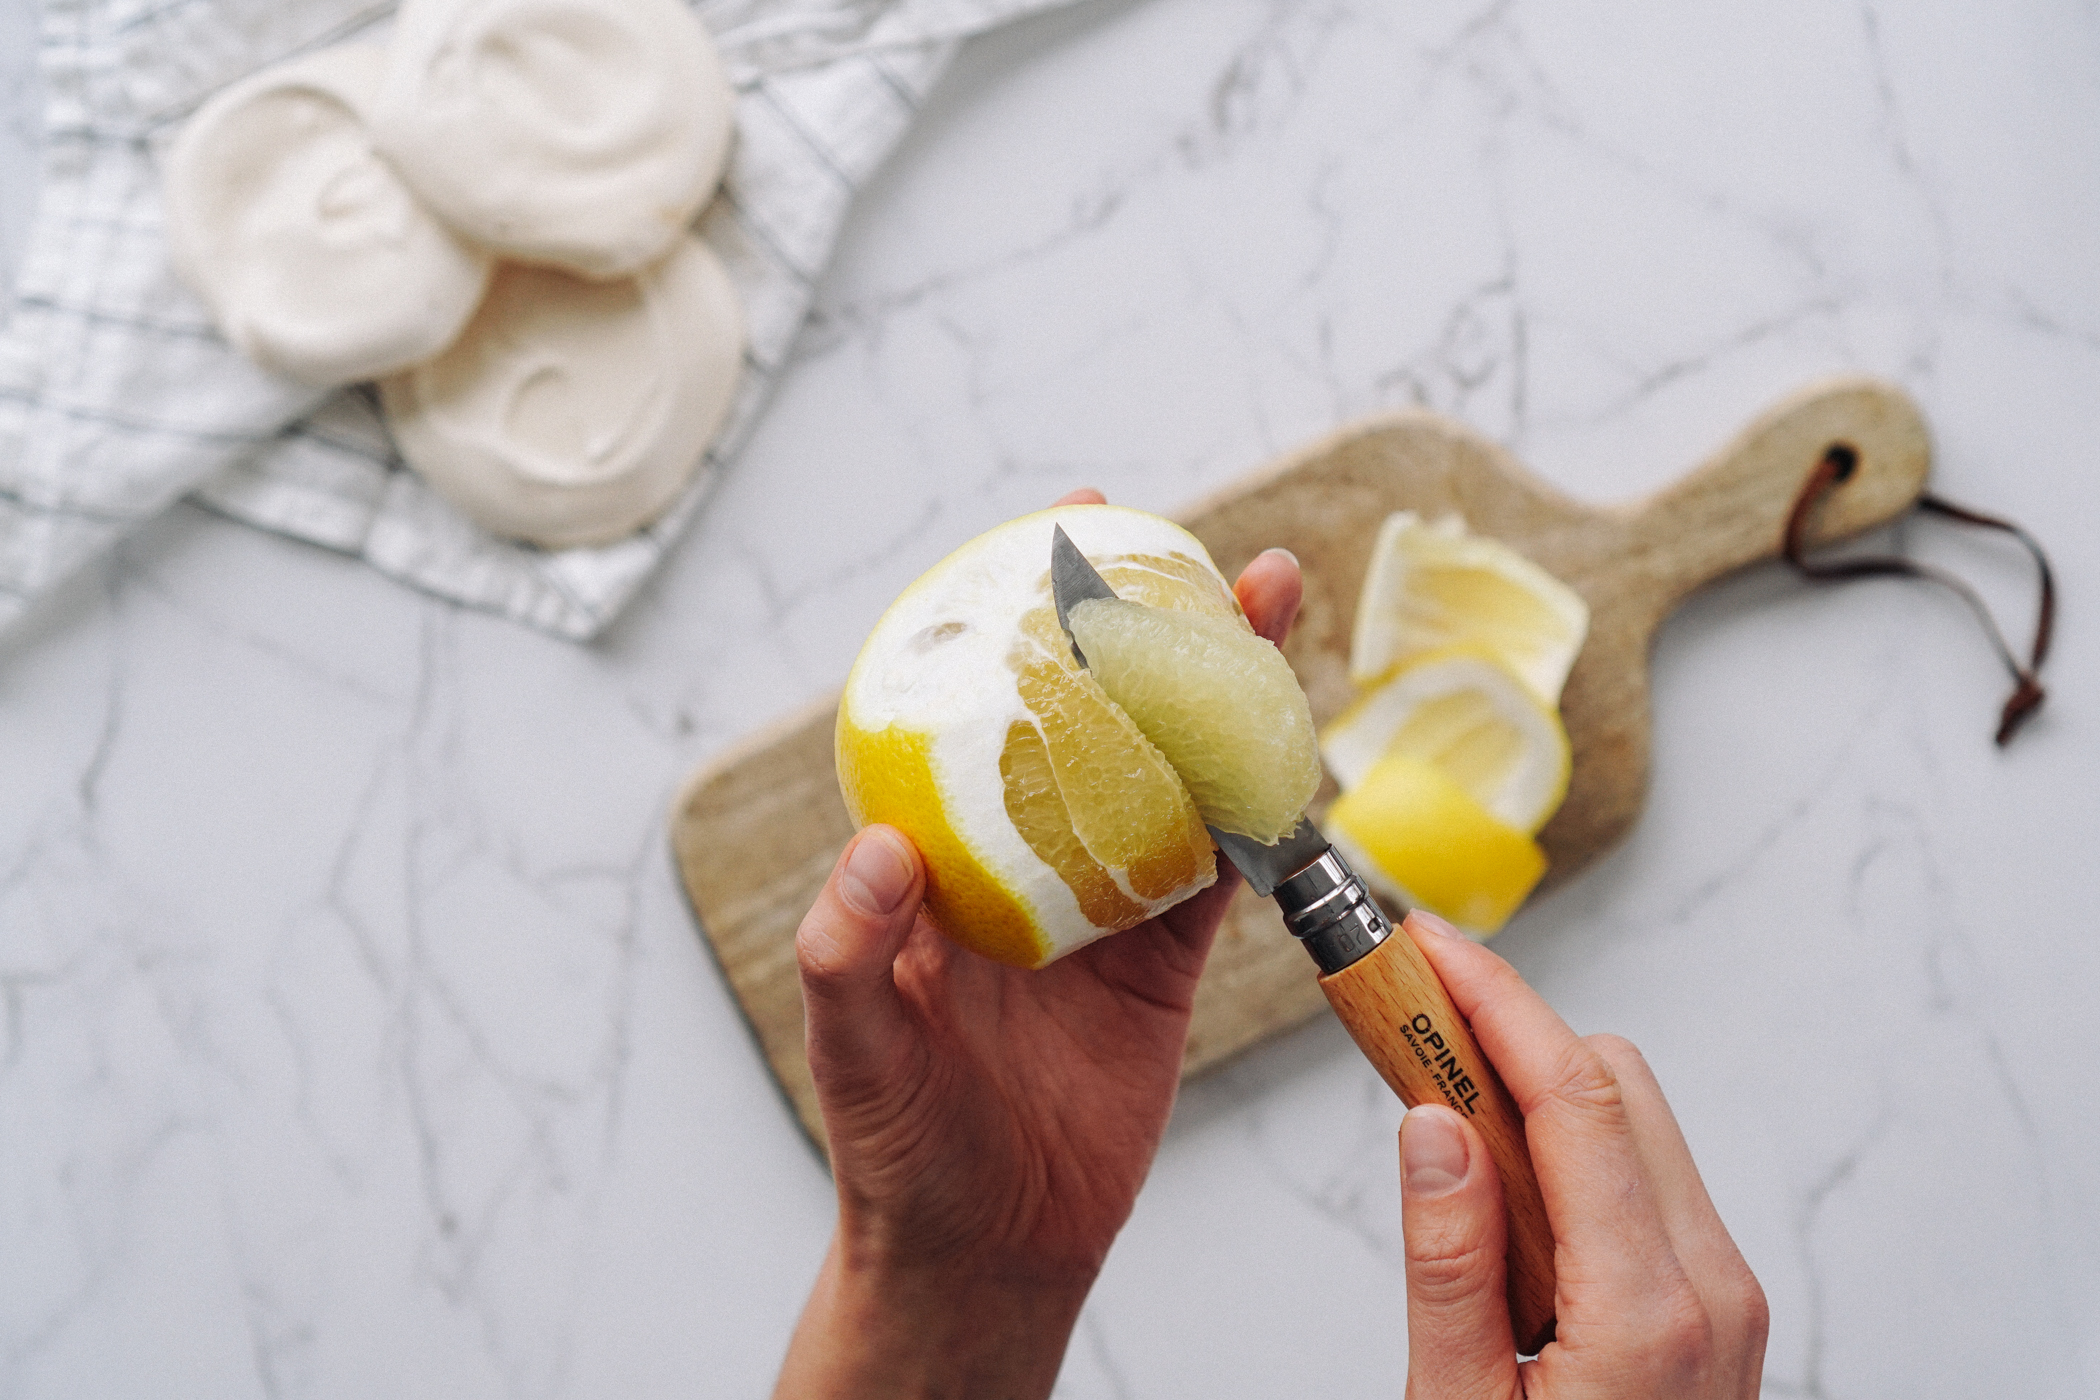 vegan_citrus_pavlova_with_coconut_cream_and_thyme-43.jpg